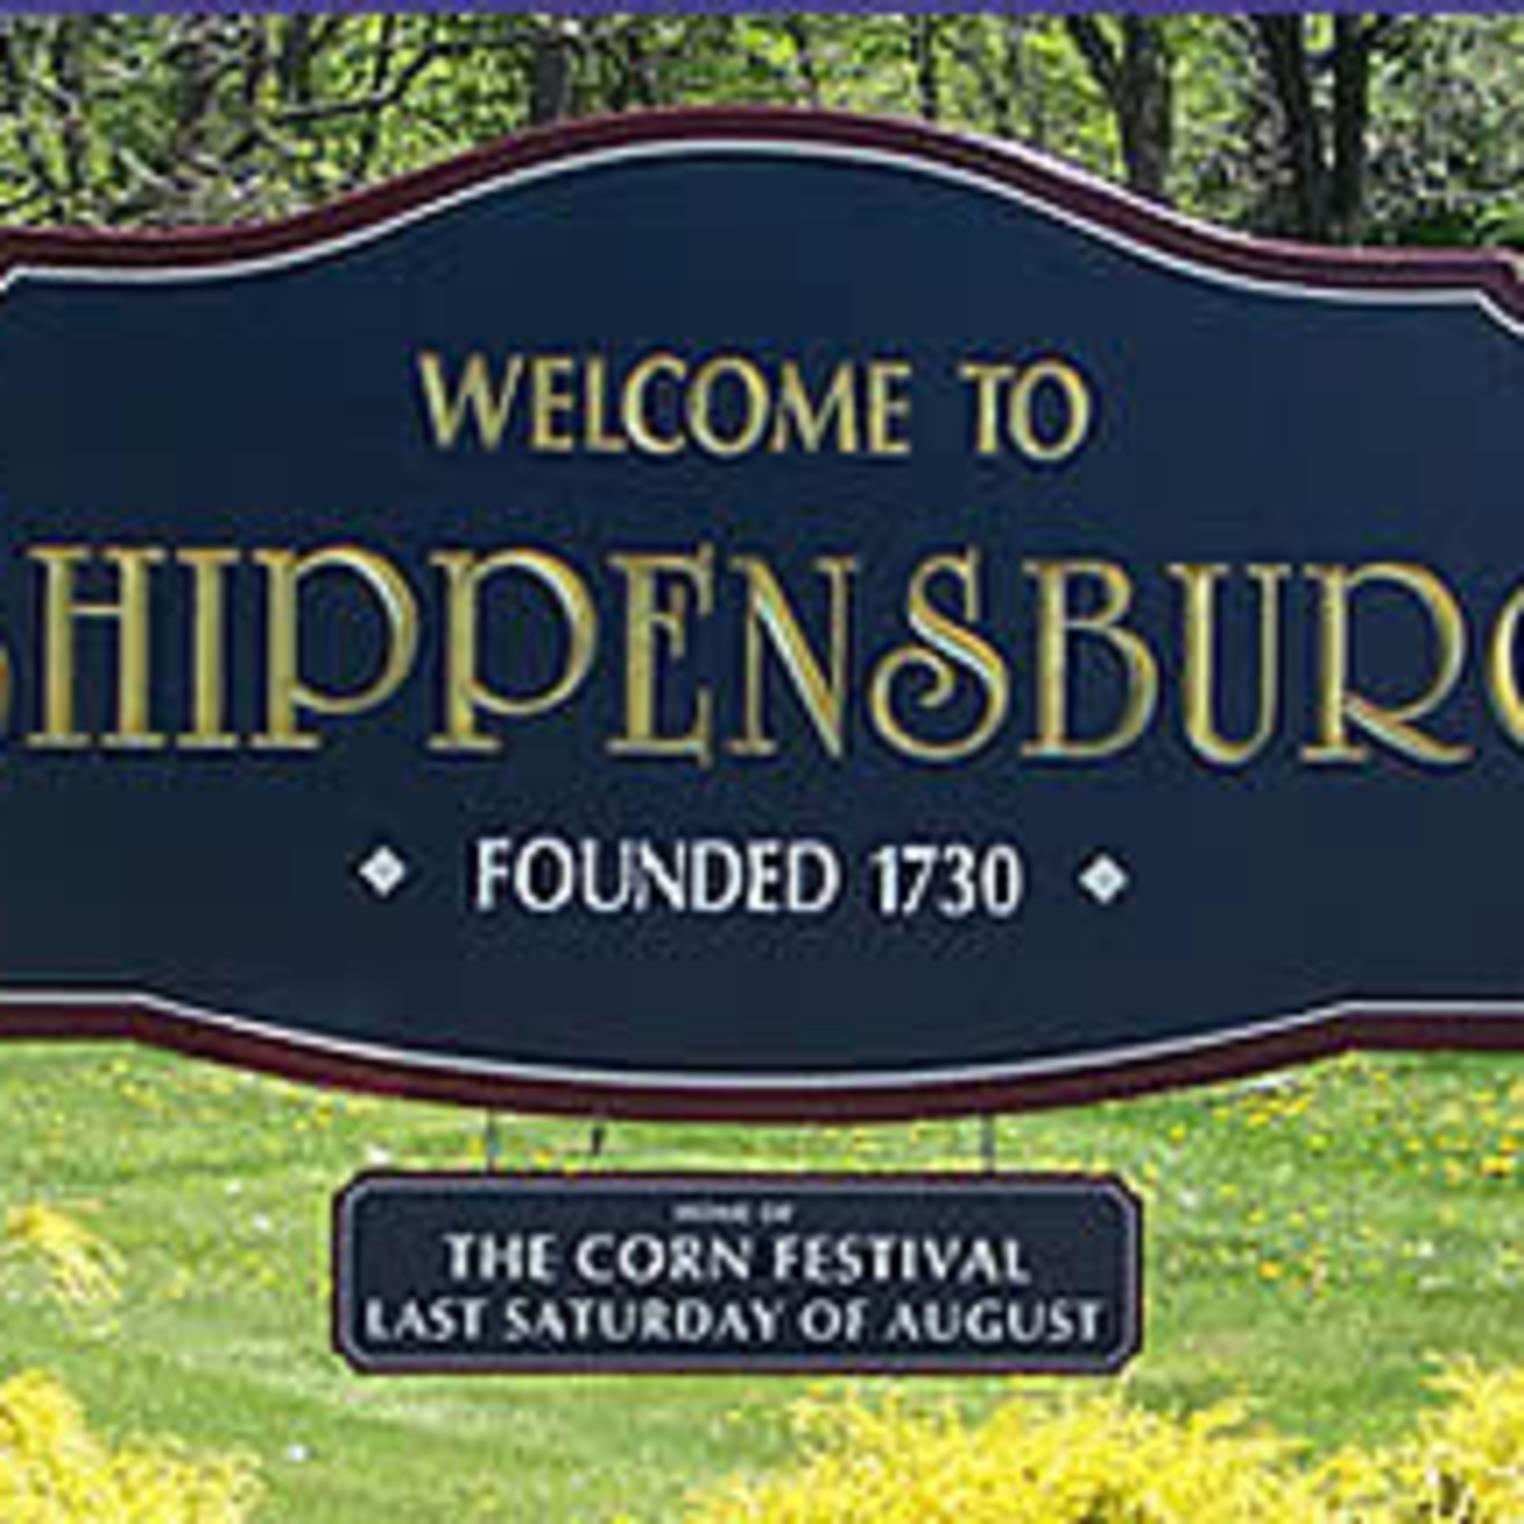 Shippensburg Borough